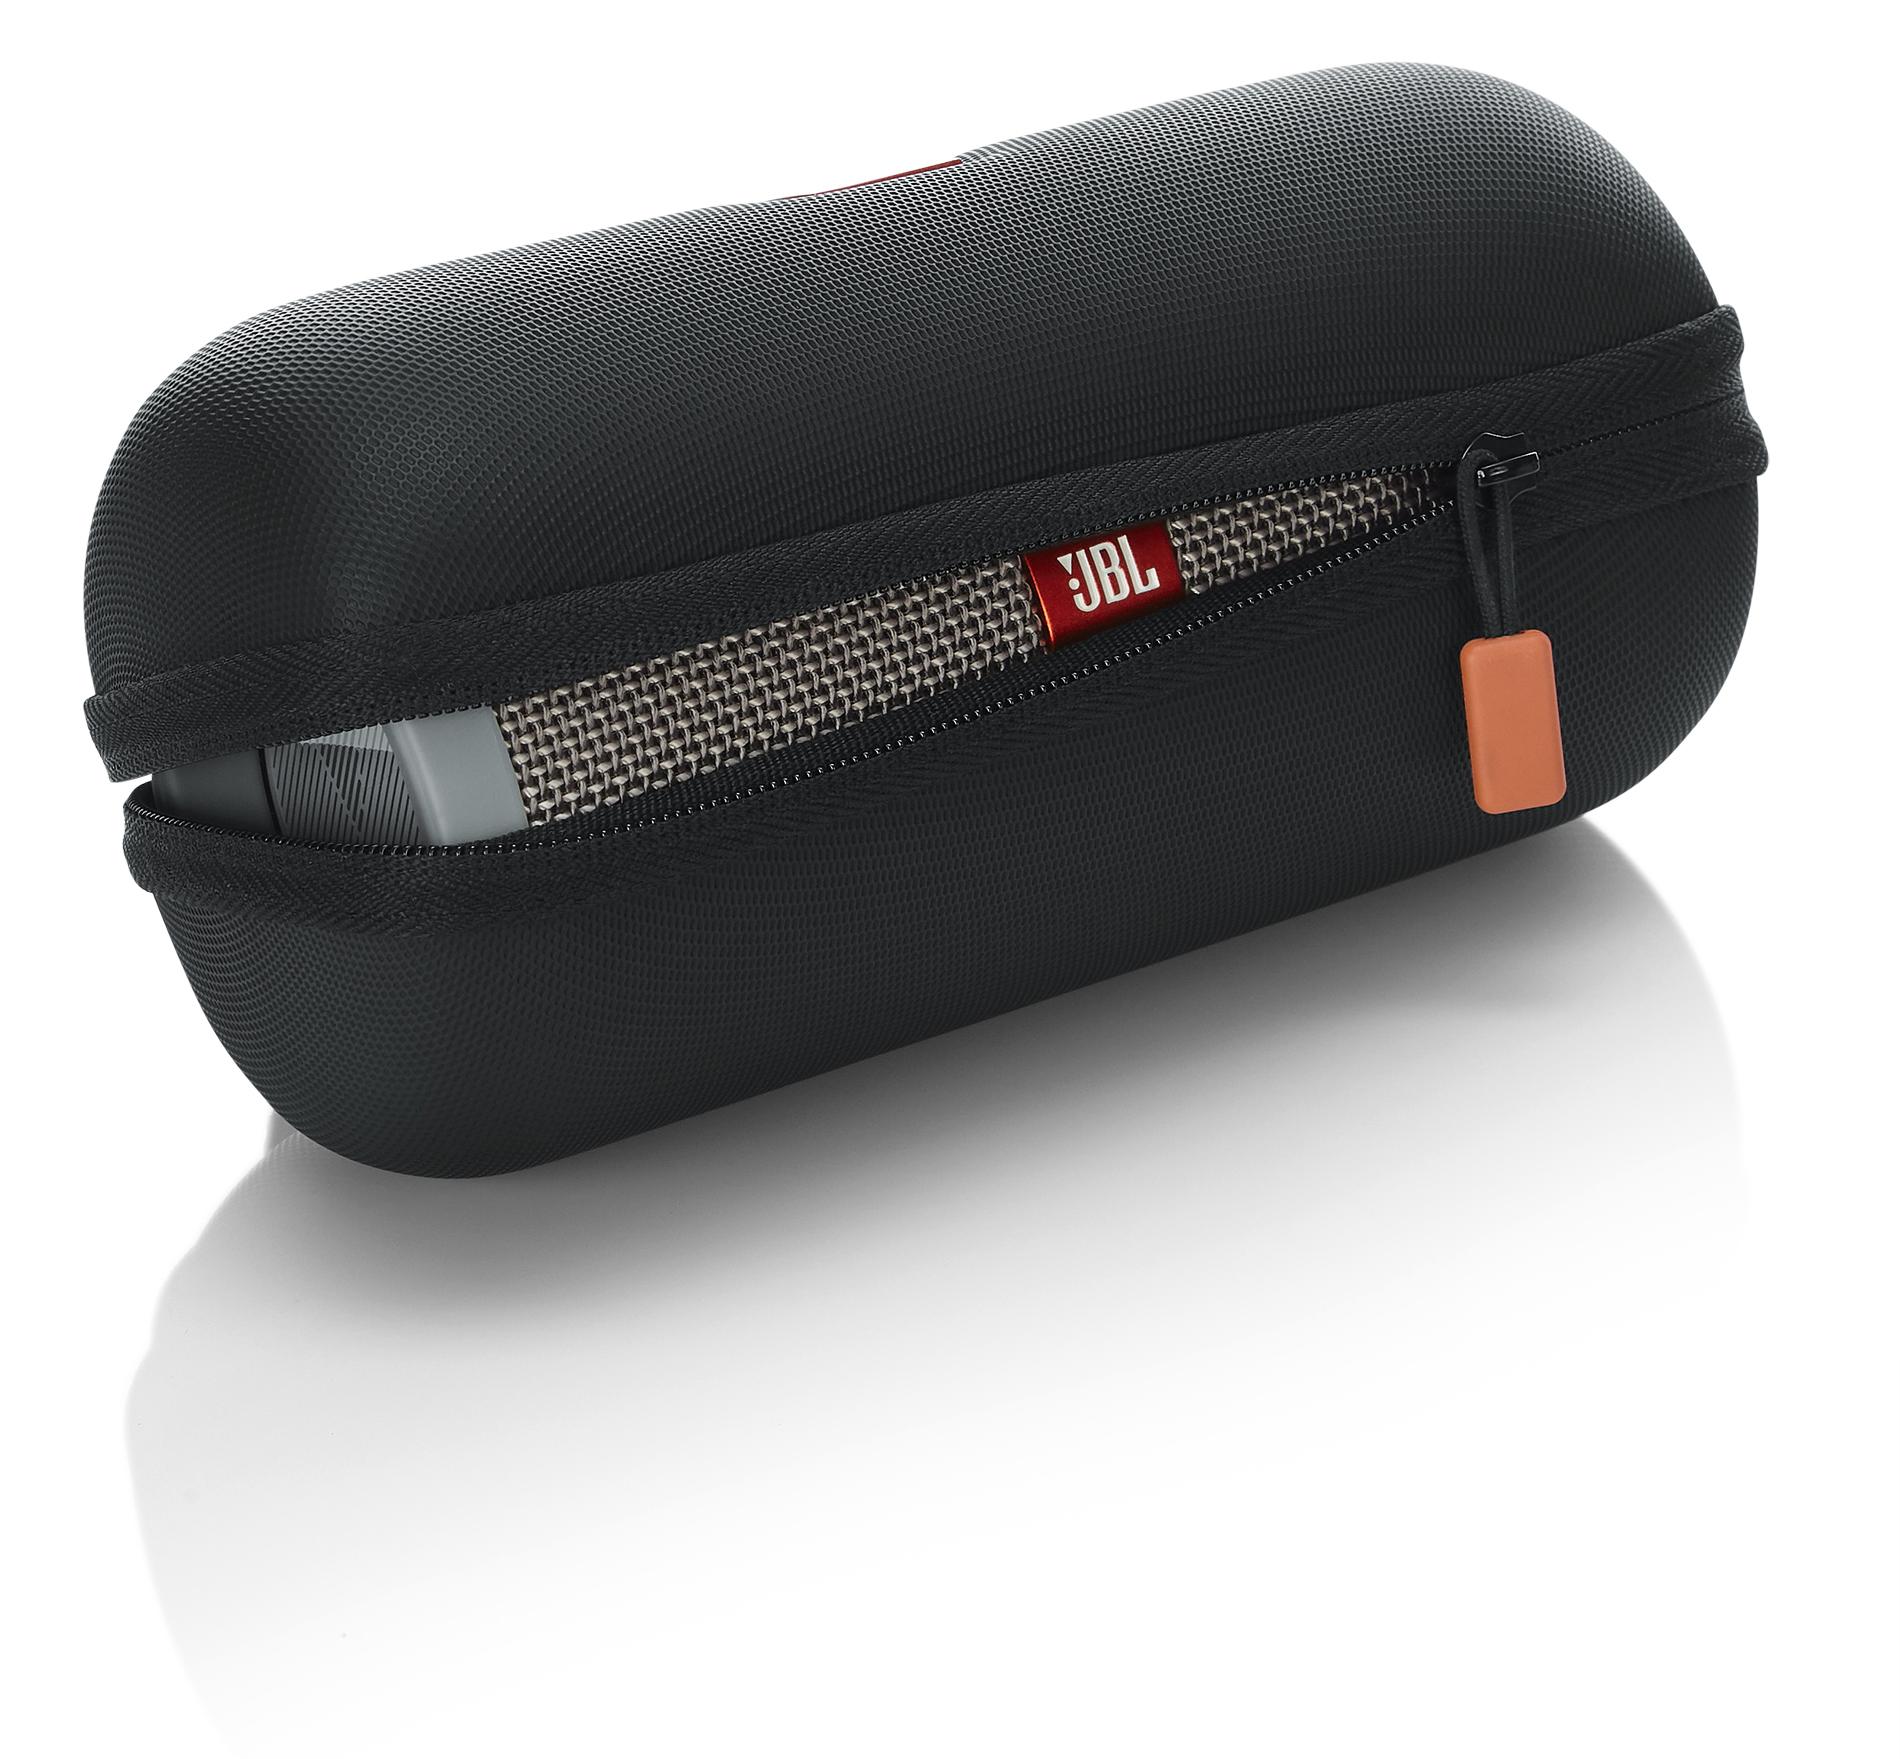 JBL FLIP 4 Case Zipper